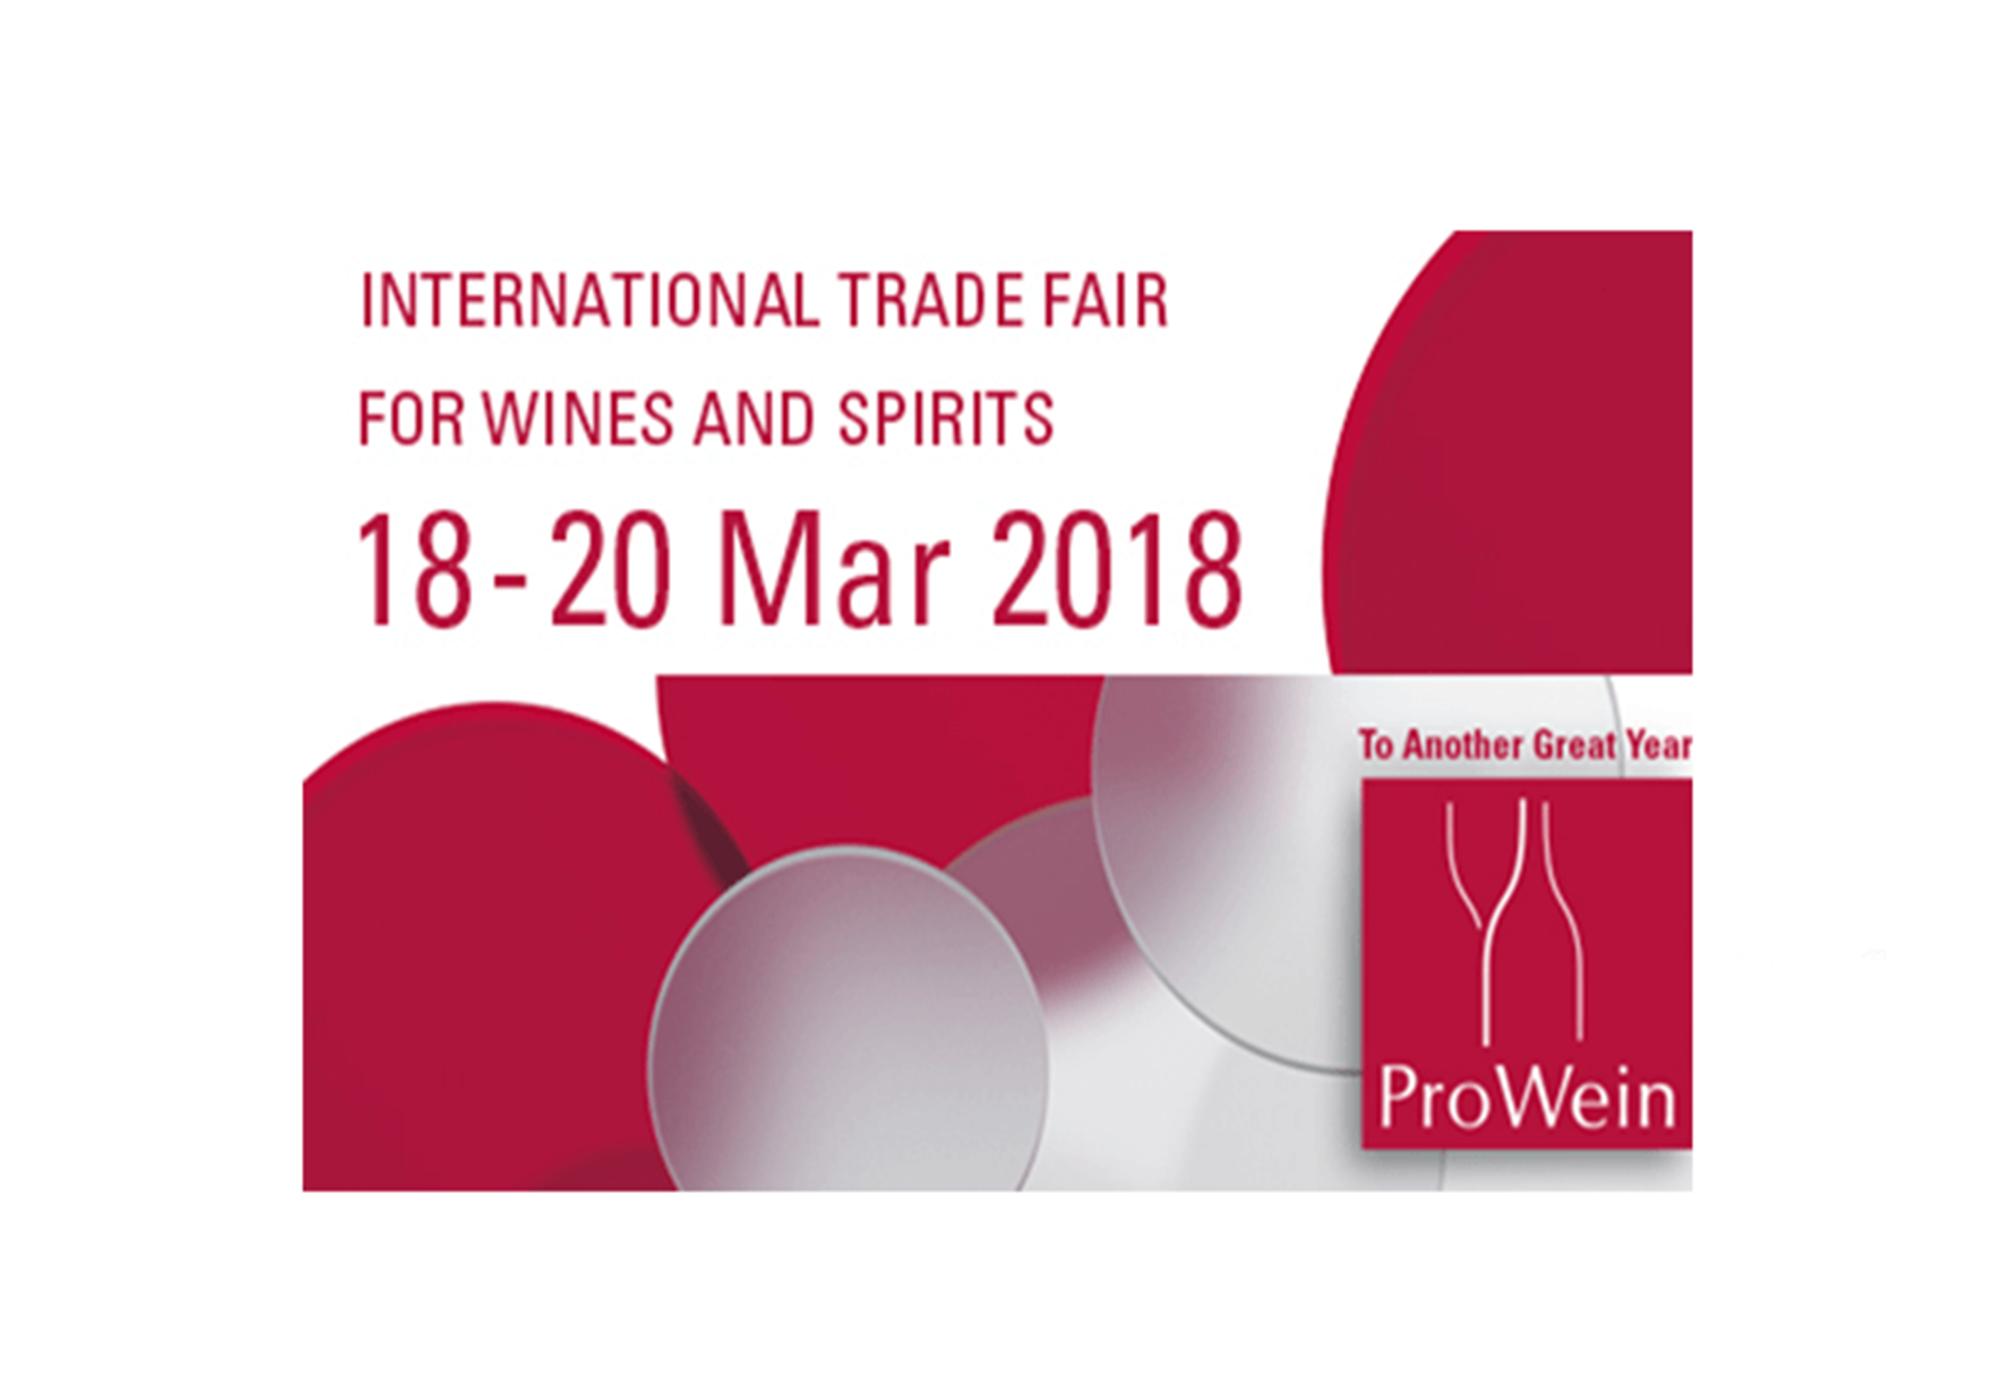 From 18 to 20 March 2018, ProWein Düsseldor